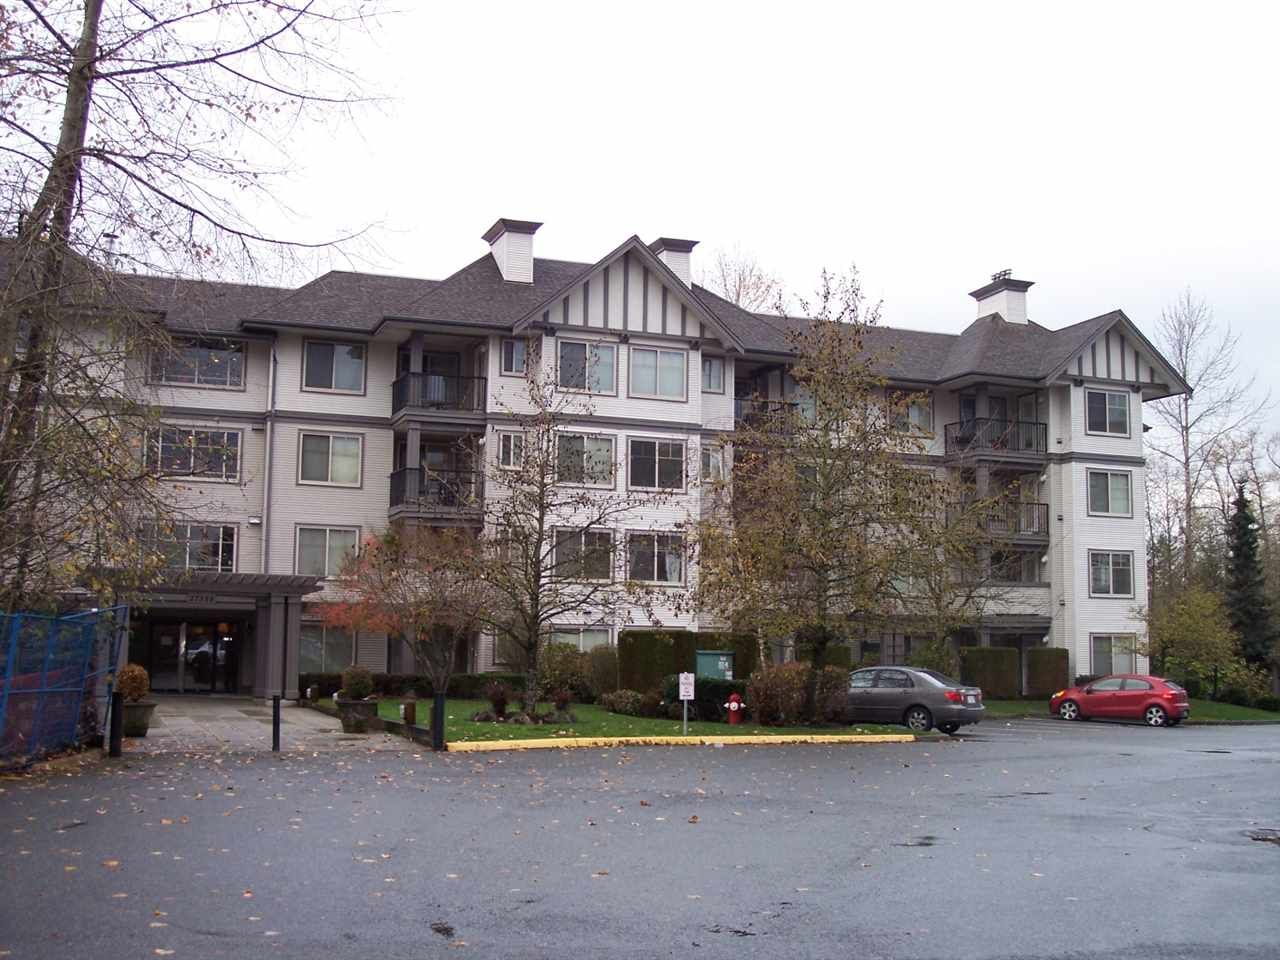 "Main Photo: 136 27358 32 Avenue in Langley: Aldergrove Langley Condo for sale in ""Willowcreek Estates 3"" : MLS®# R2123878"